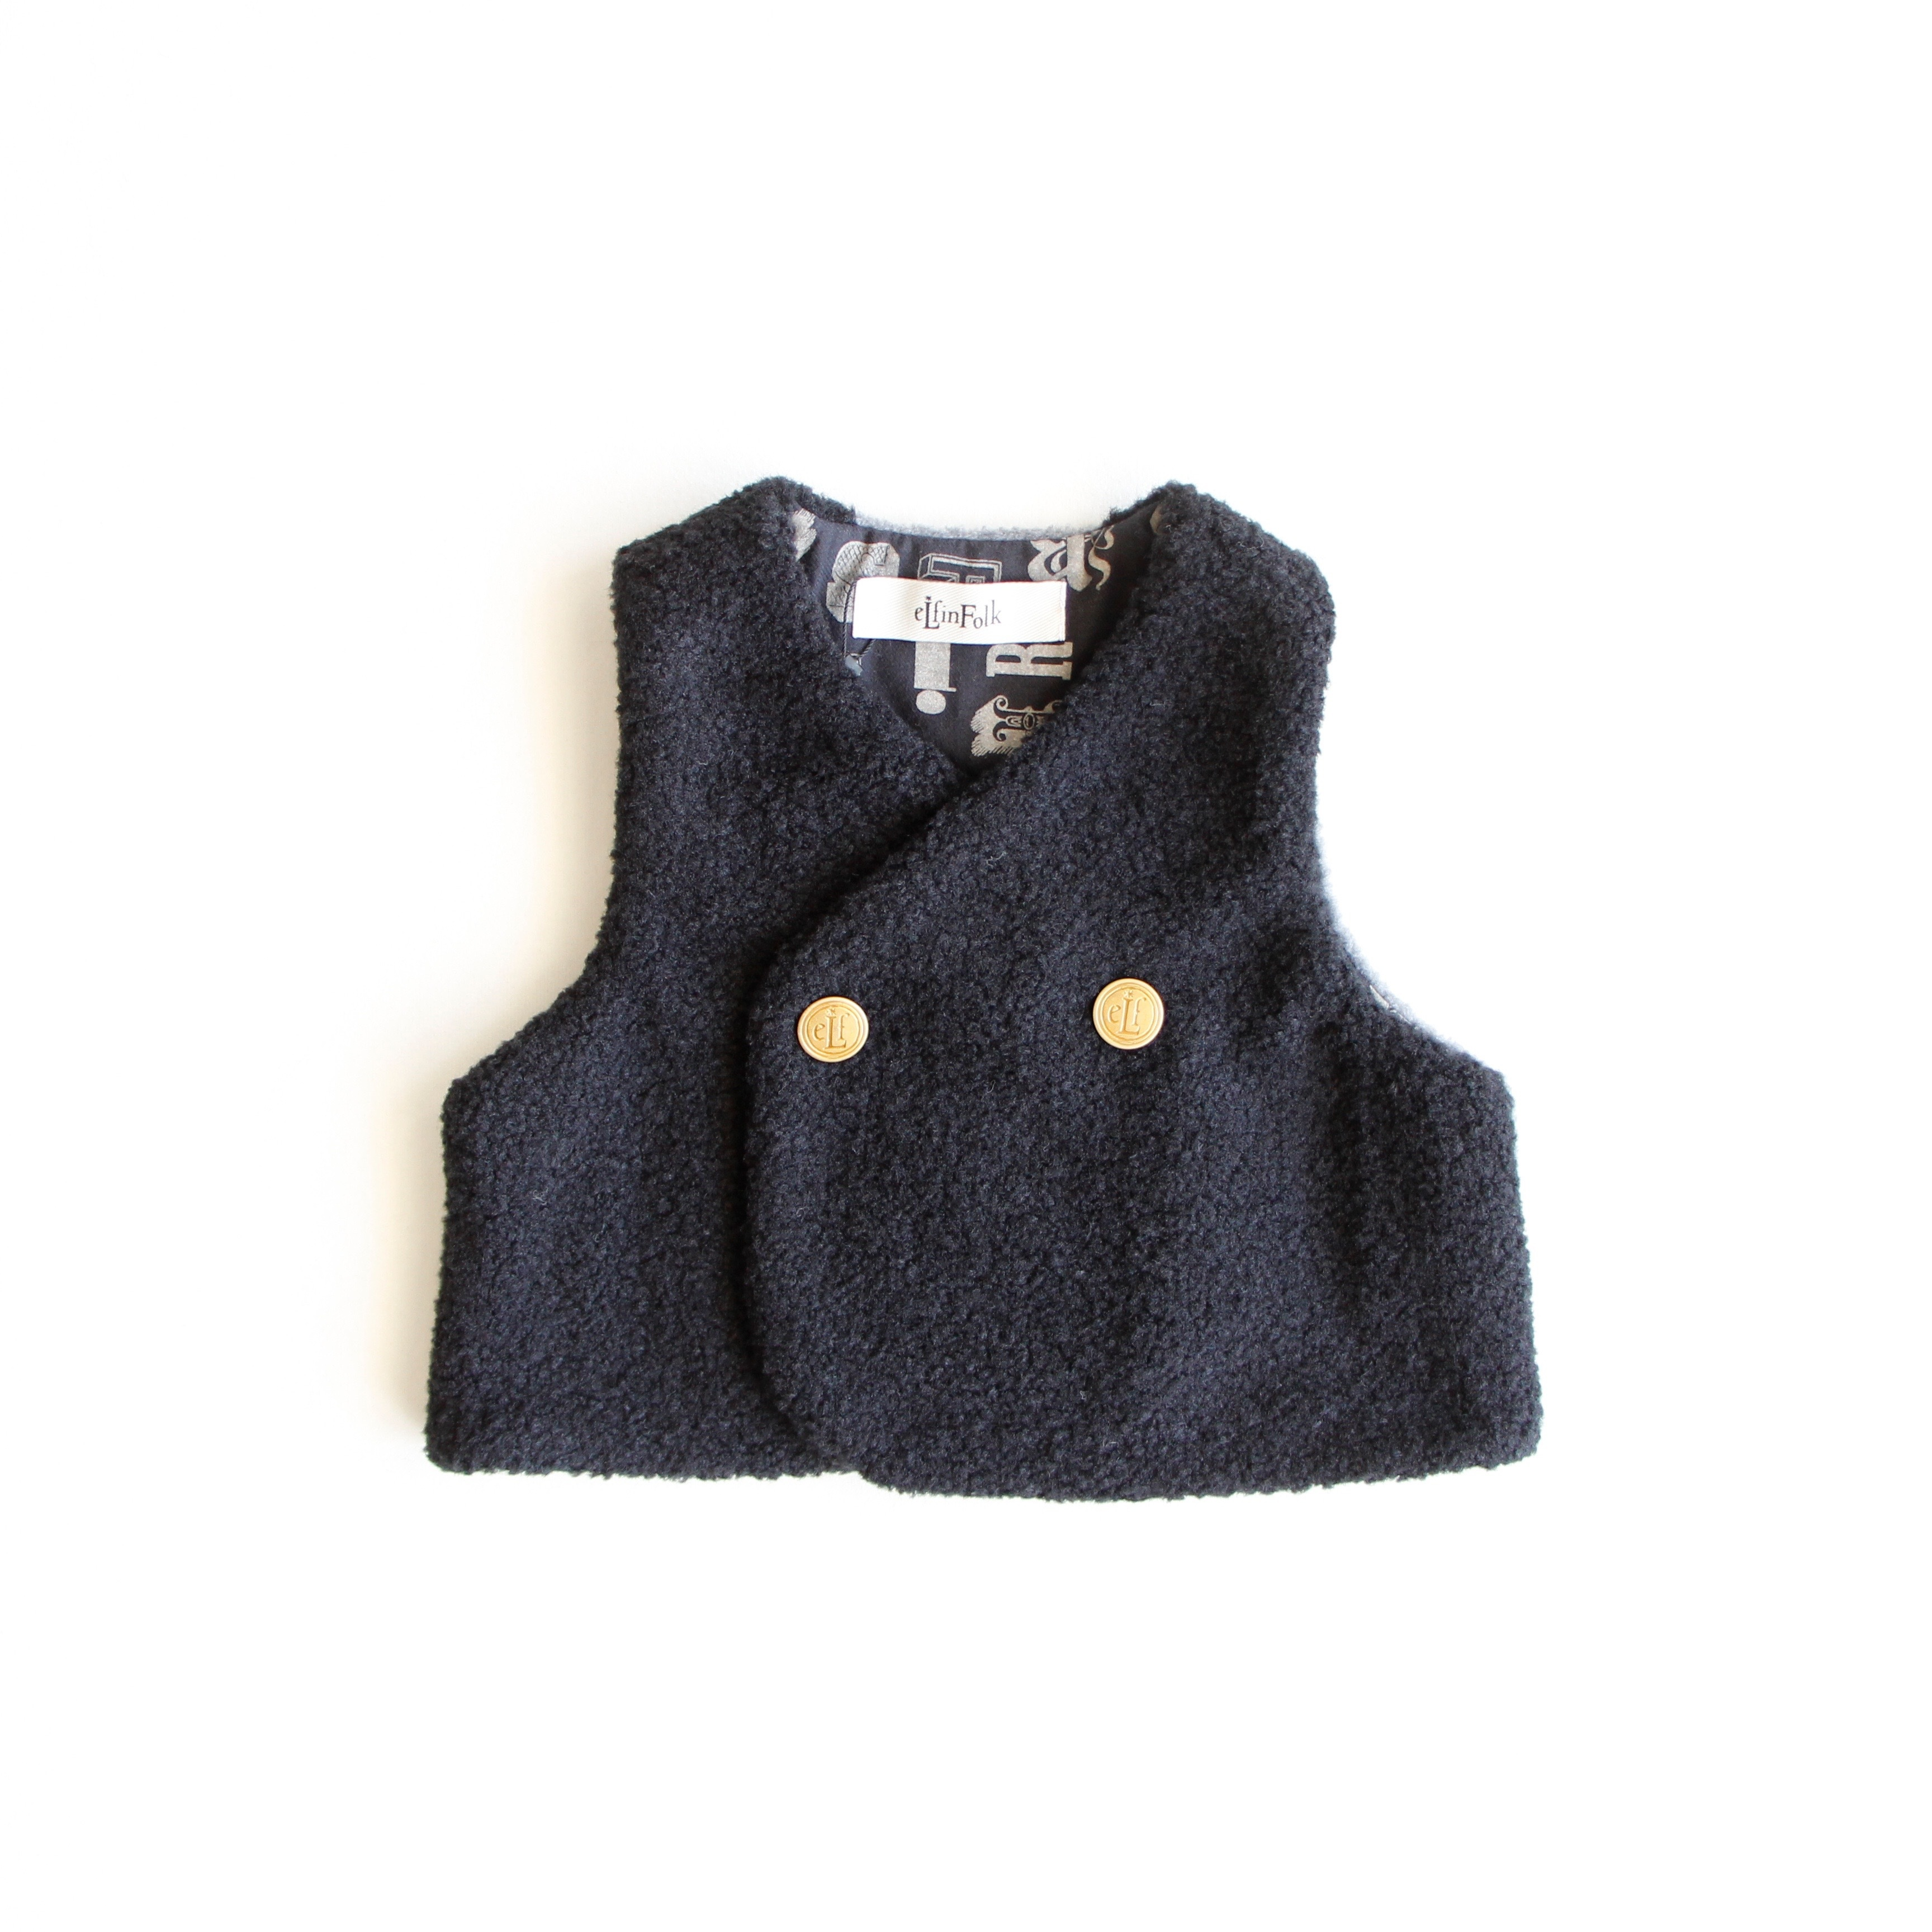 《eLfinFolk 2018AW》sheep boa  baby vest / black / 80-100cm